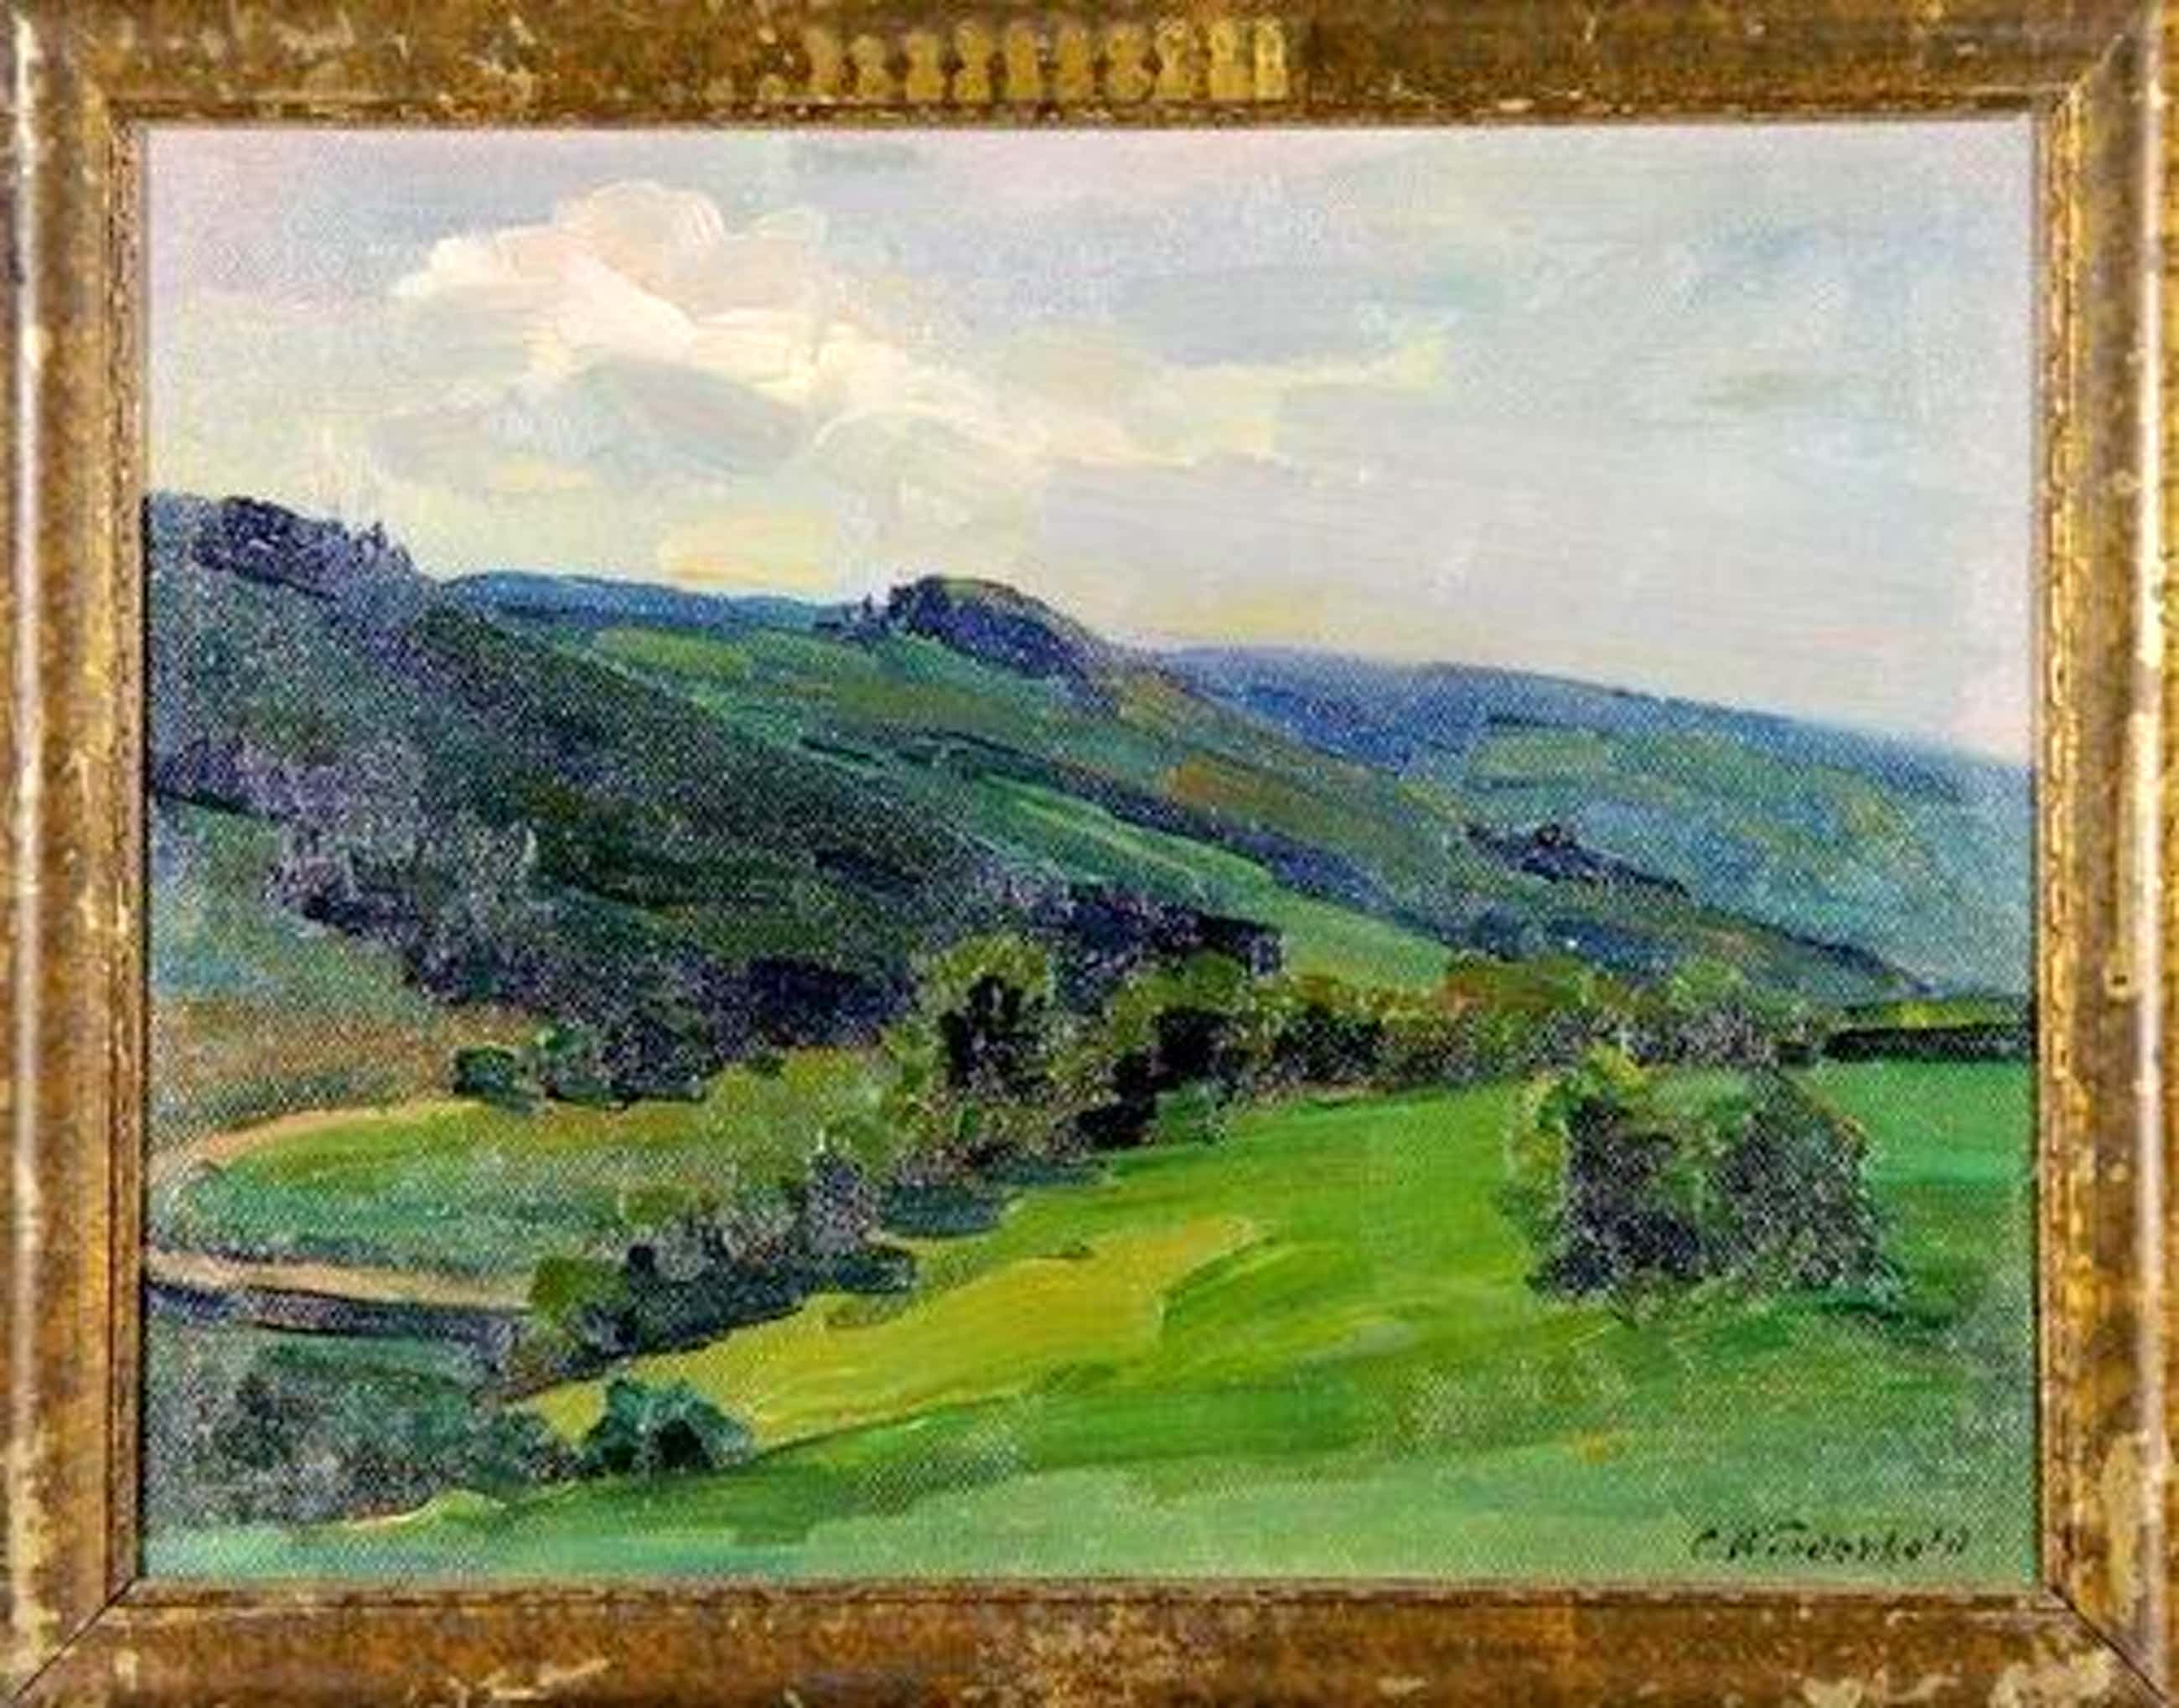 Carl Wiederhold - Teutoburger Landschaft, Öl Gemälde kopen? Bied vanaf 430!